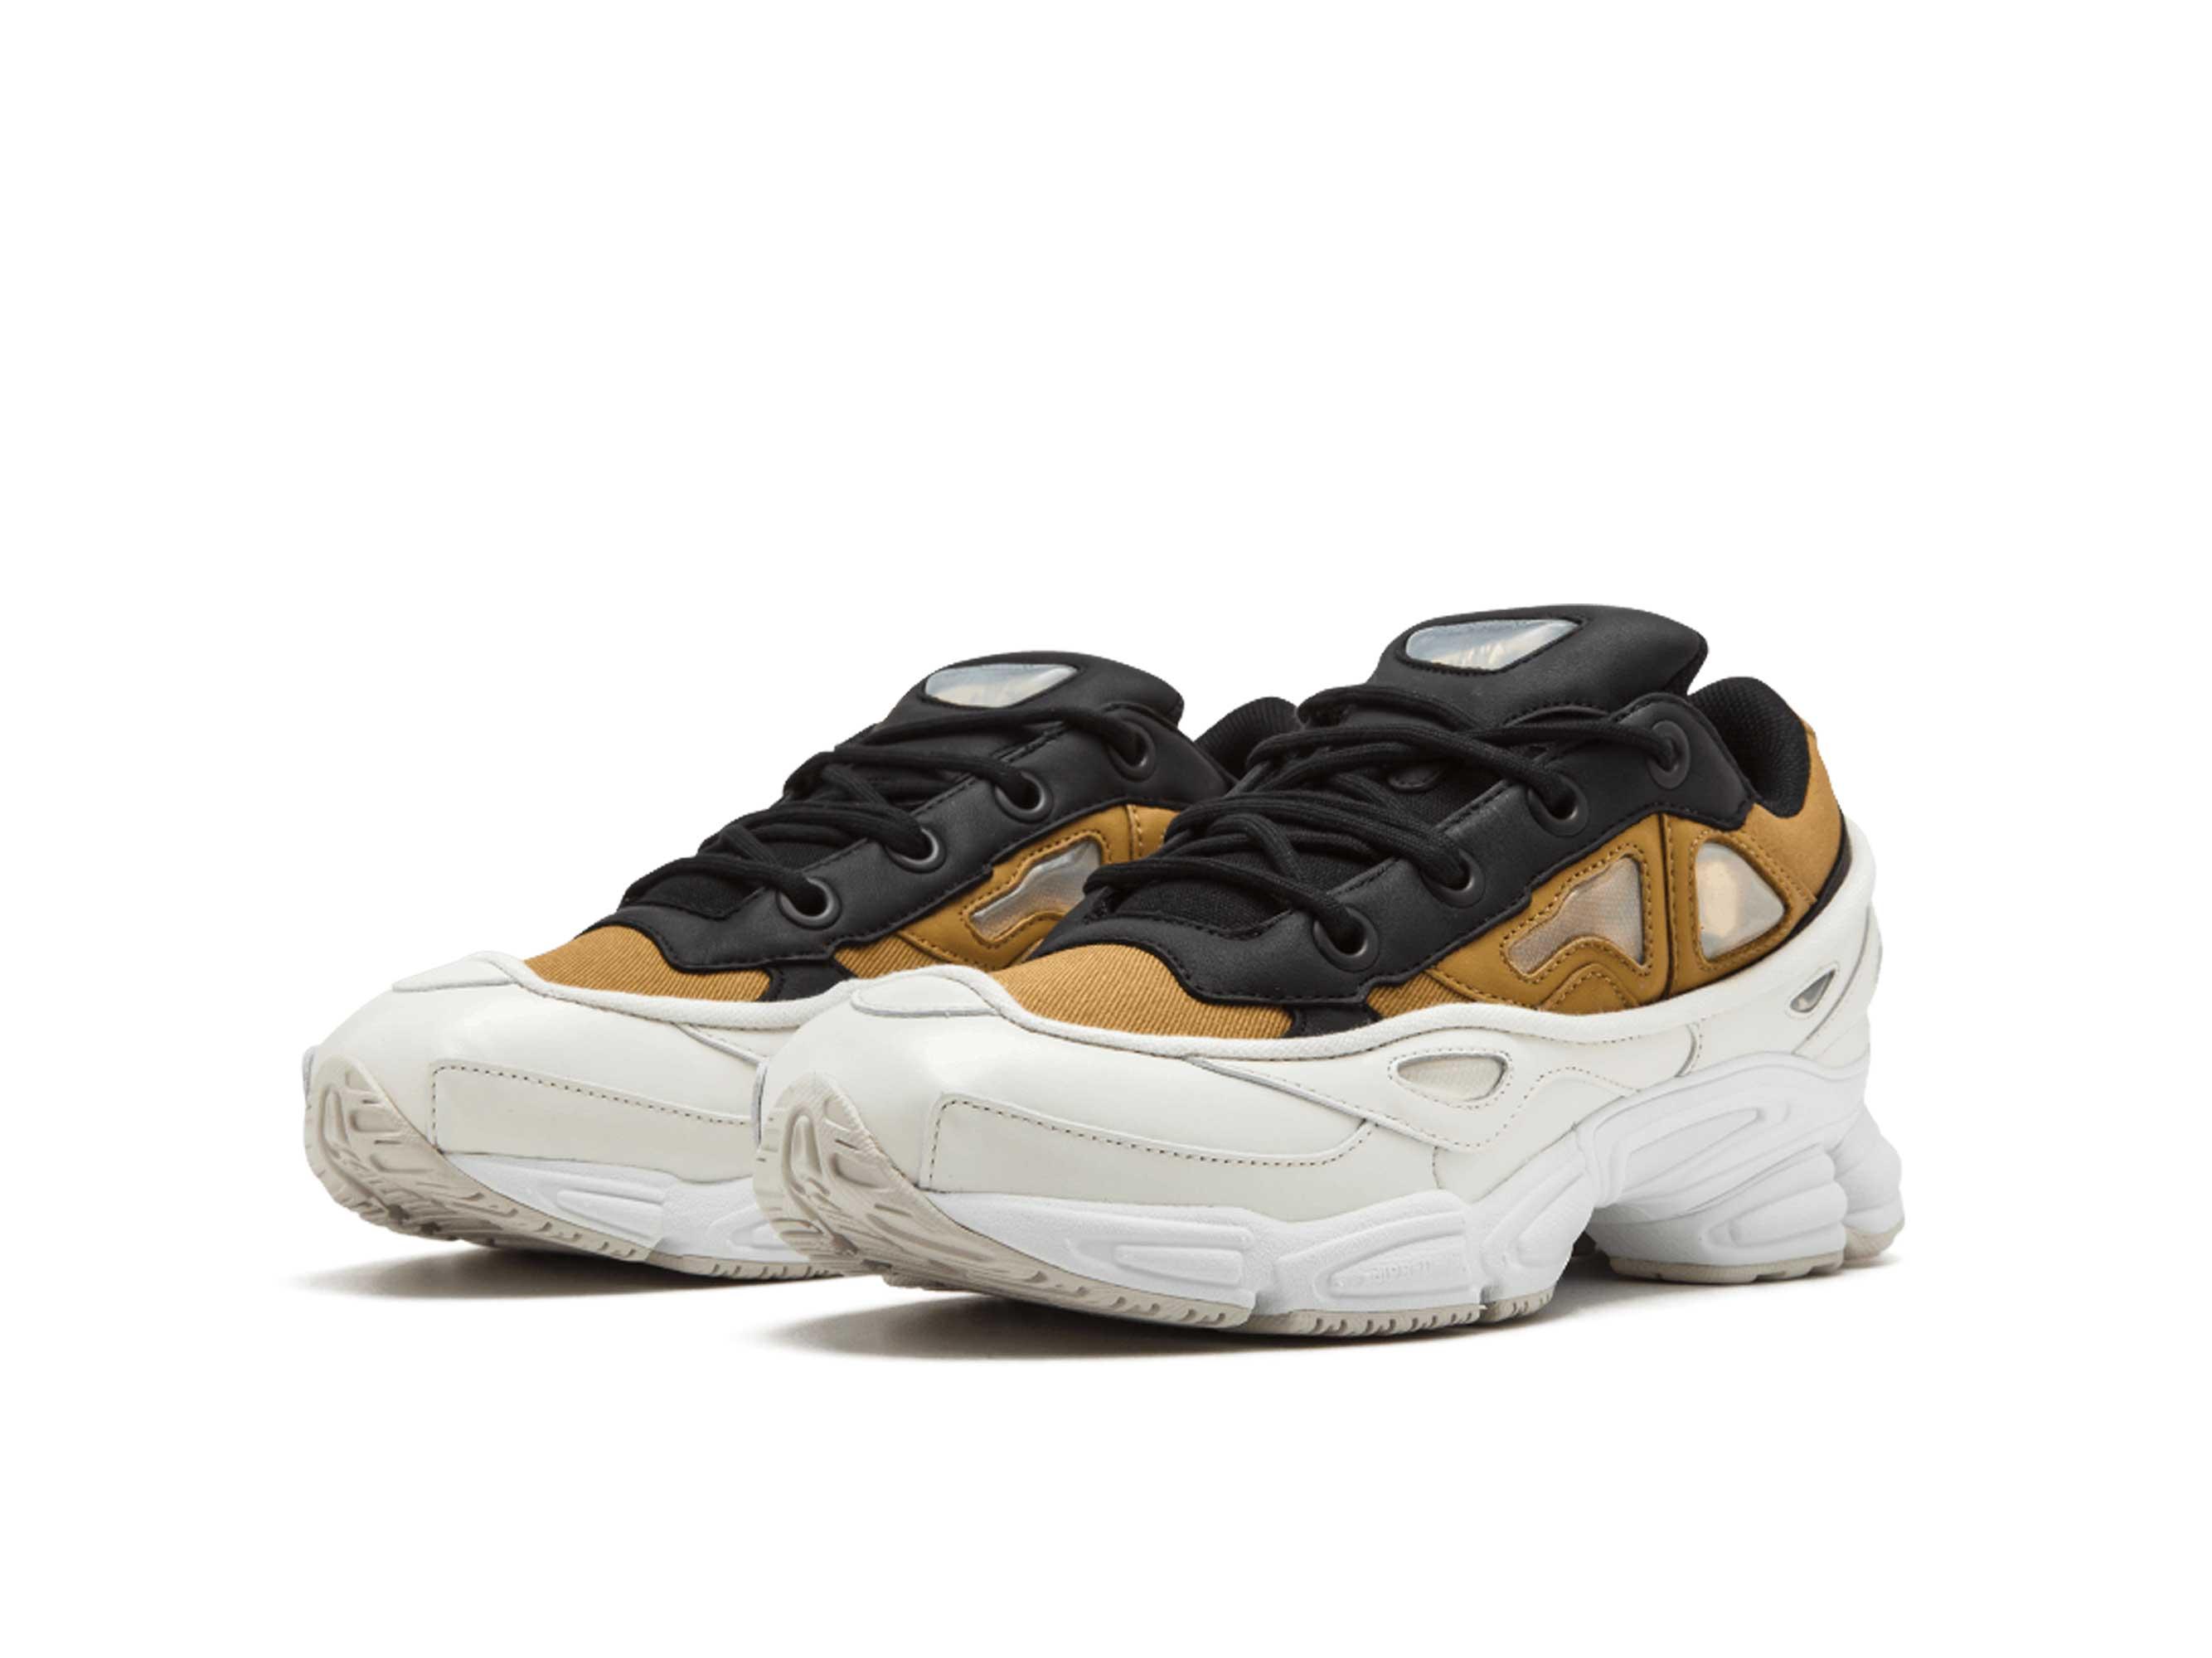 df5348ef8 adidas x Raf Simons ozweego white brown black ⋆ adidas интернет магазин